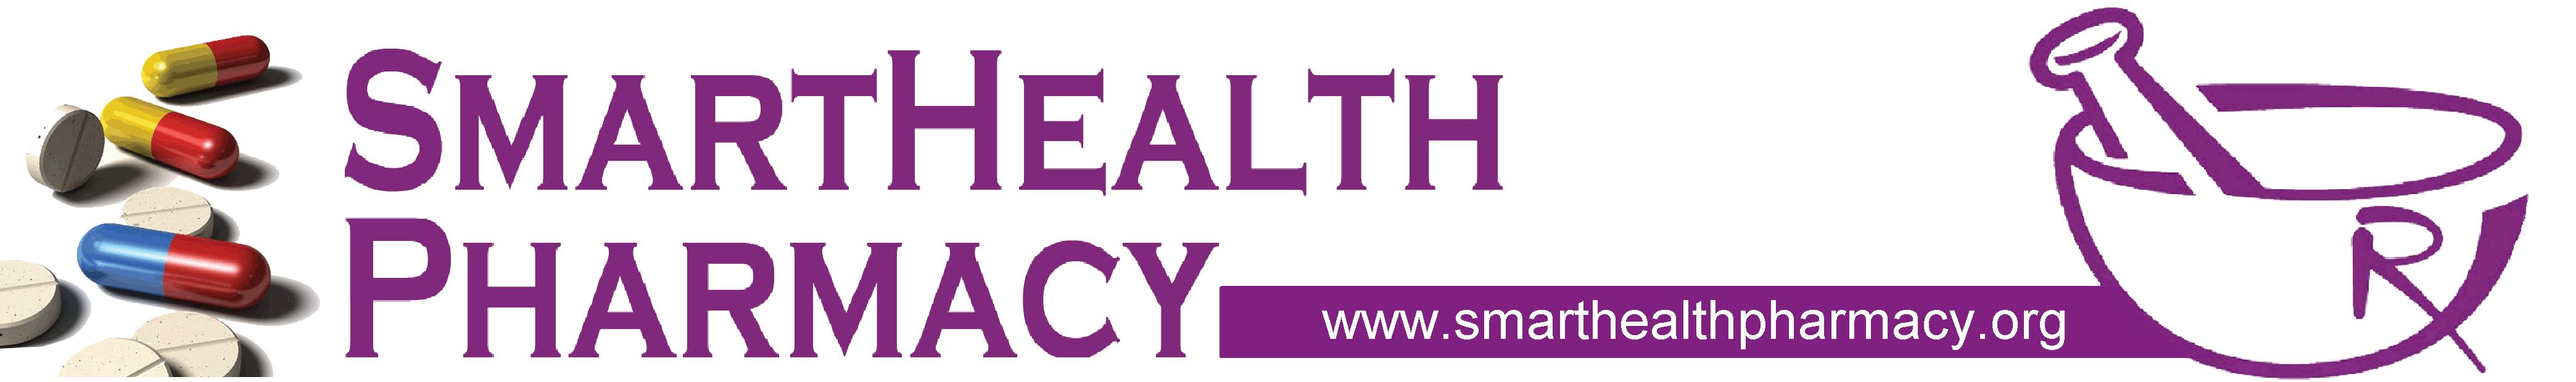 SmartHealth Pharmacy